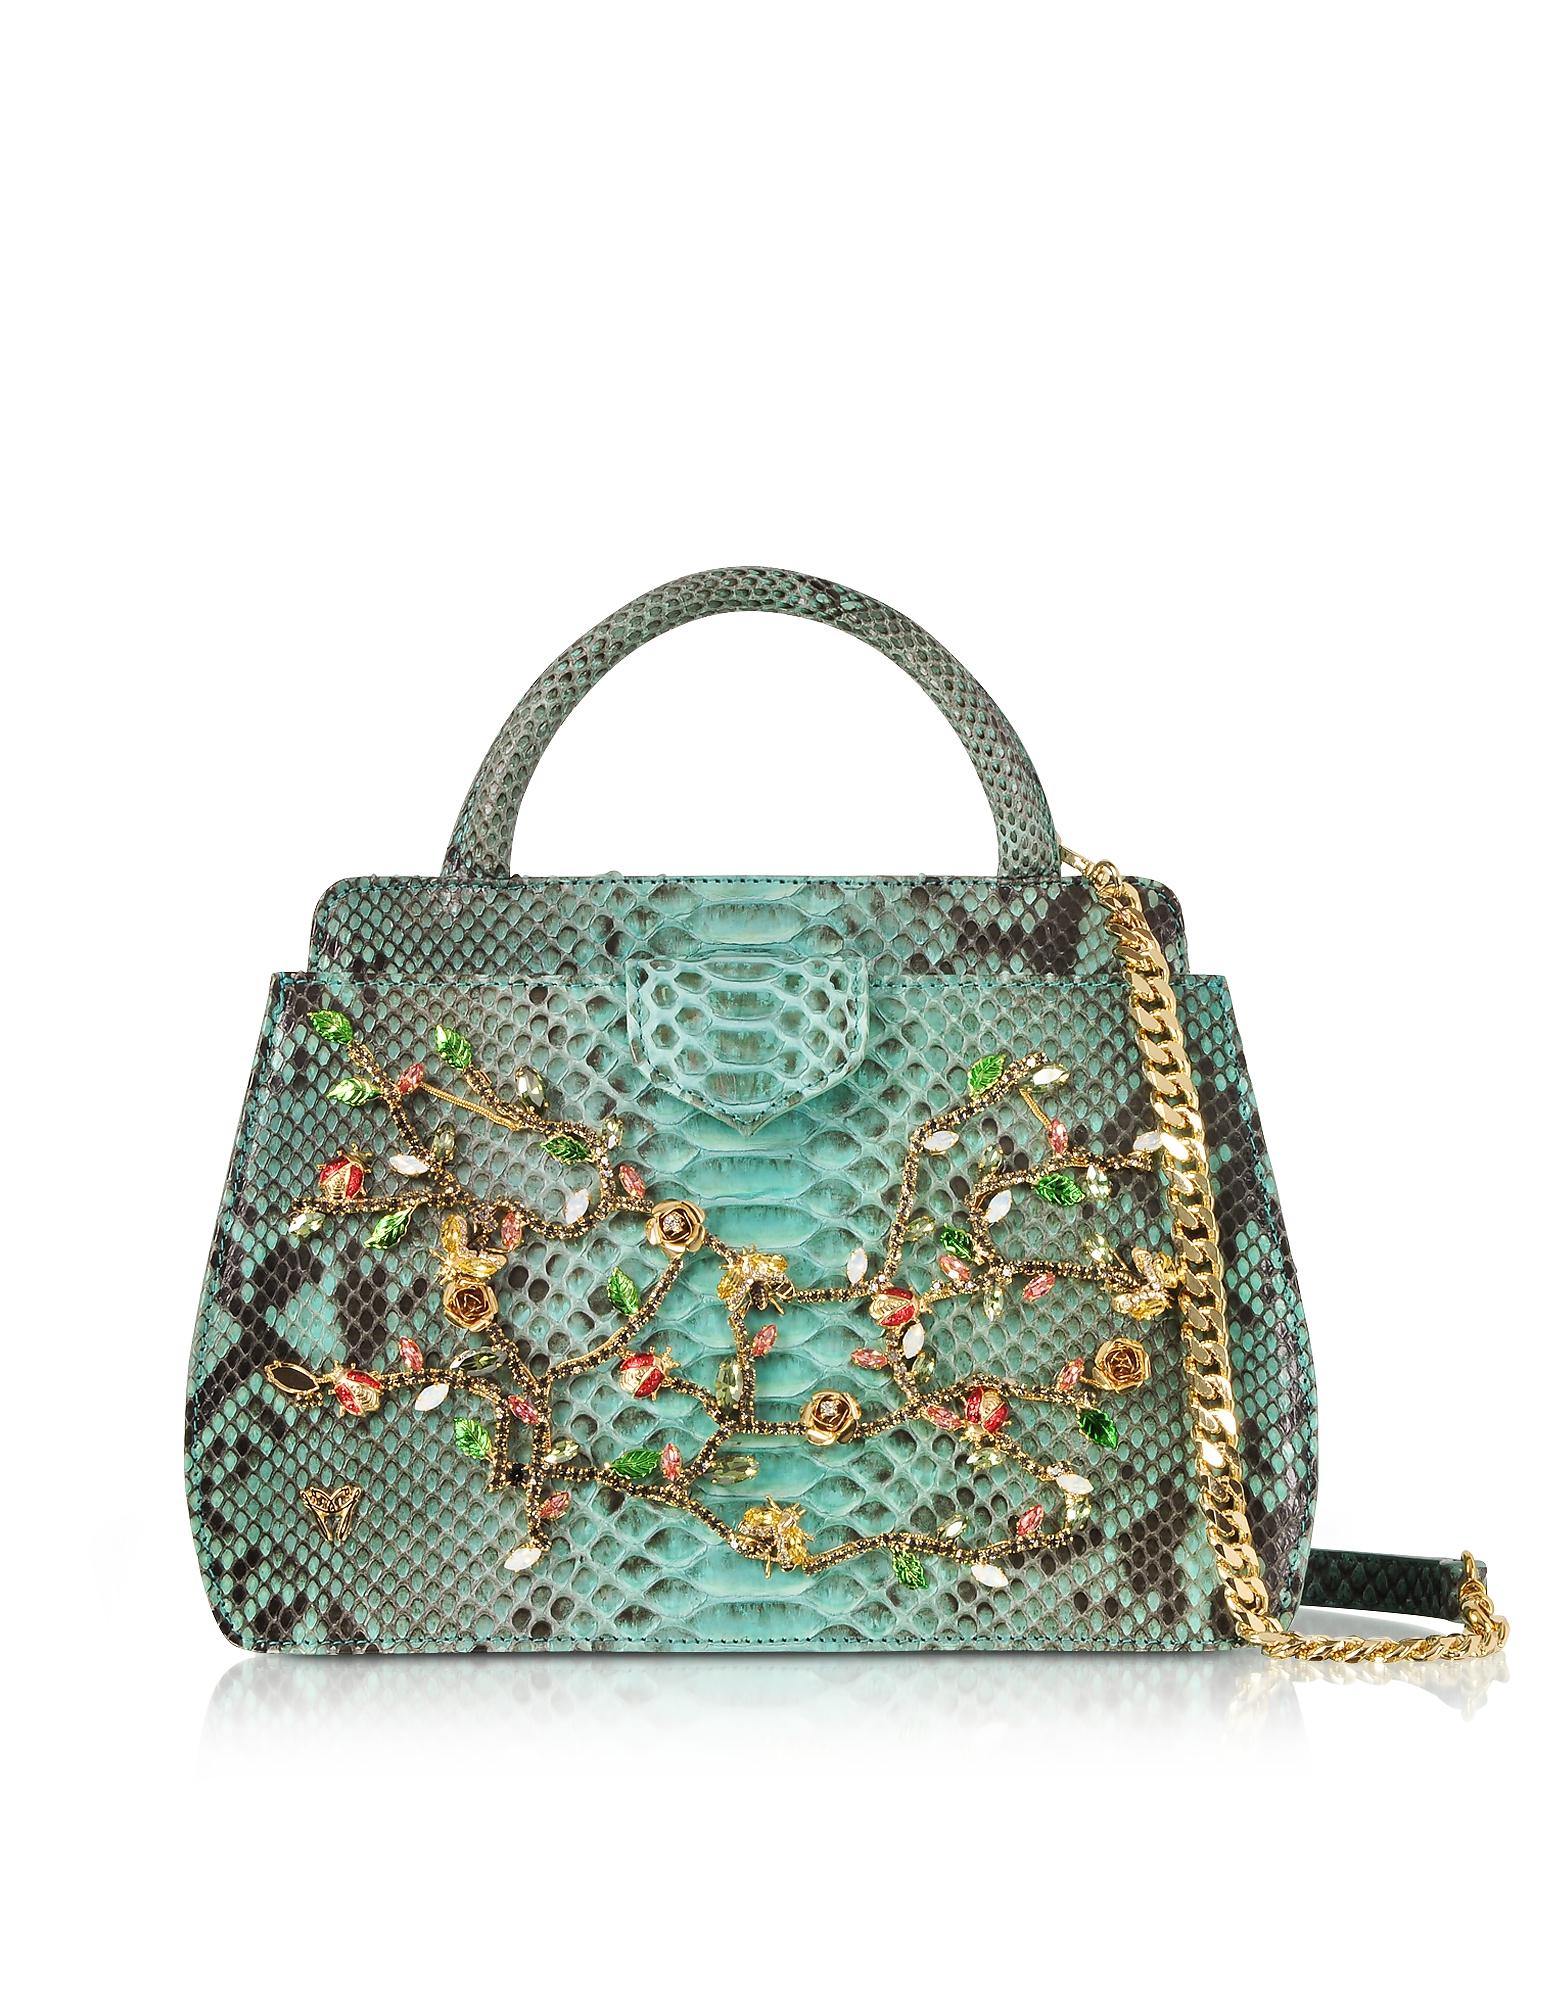 Ghibli Handbags, Aquamarine Python and Crystals Top-Handle Satchel Bag